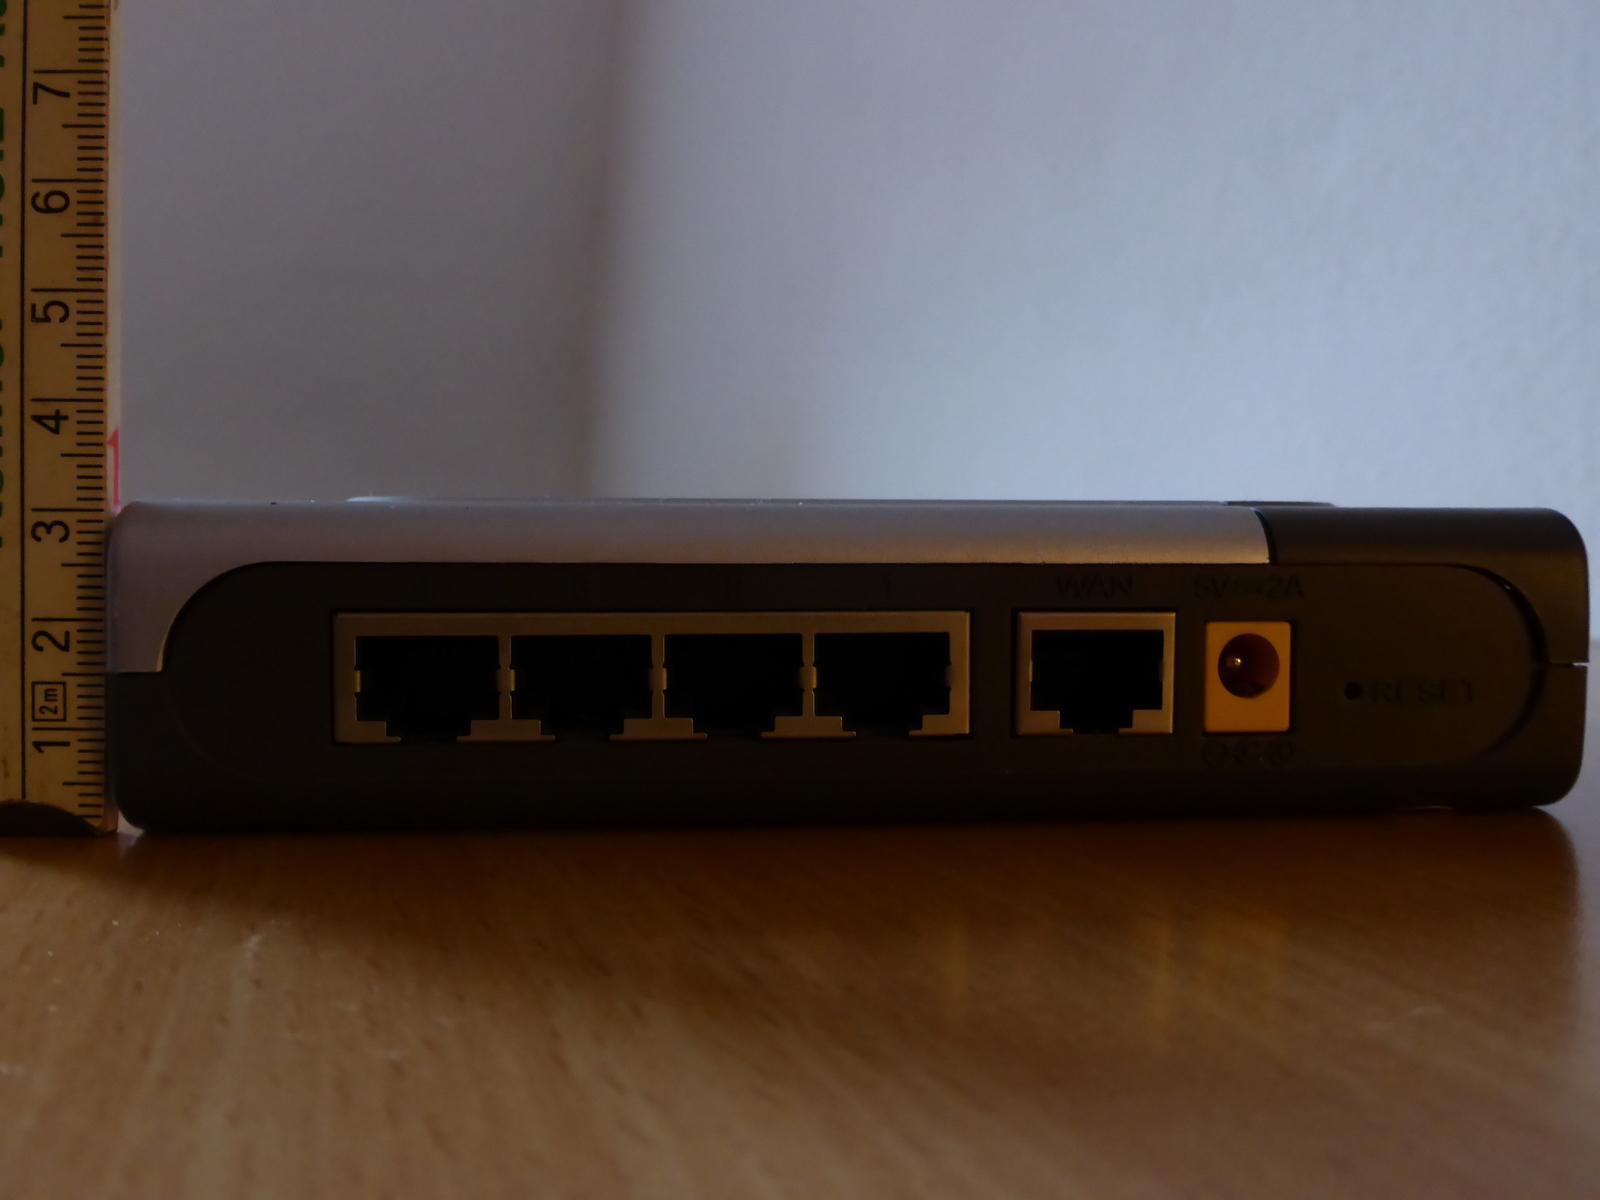 File:D-link-604-dsl-router-back jpg - Wikimedia Commons